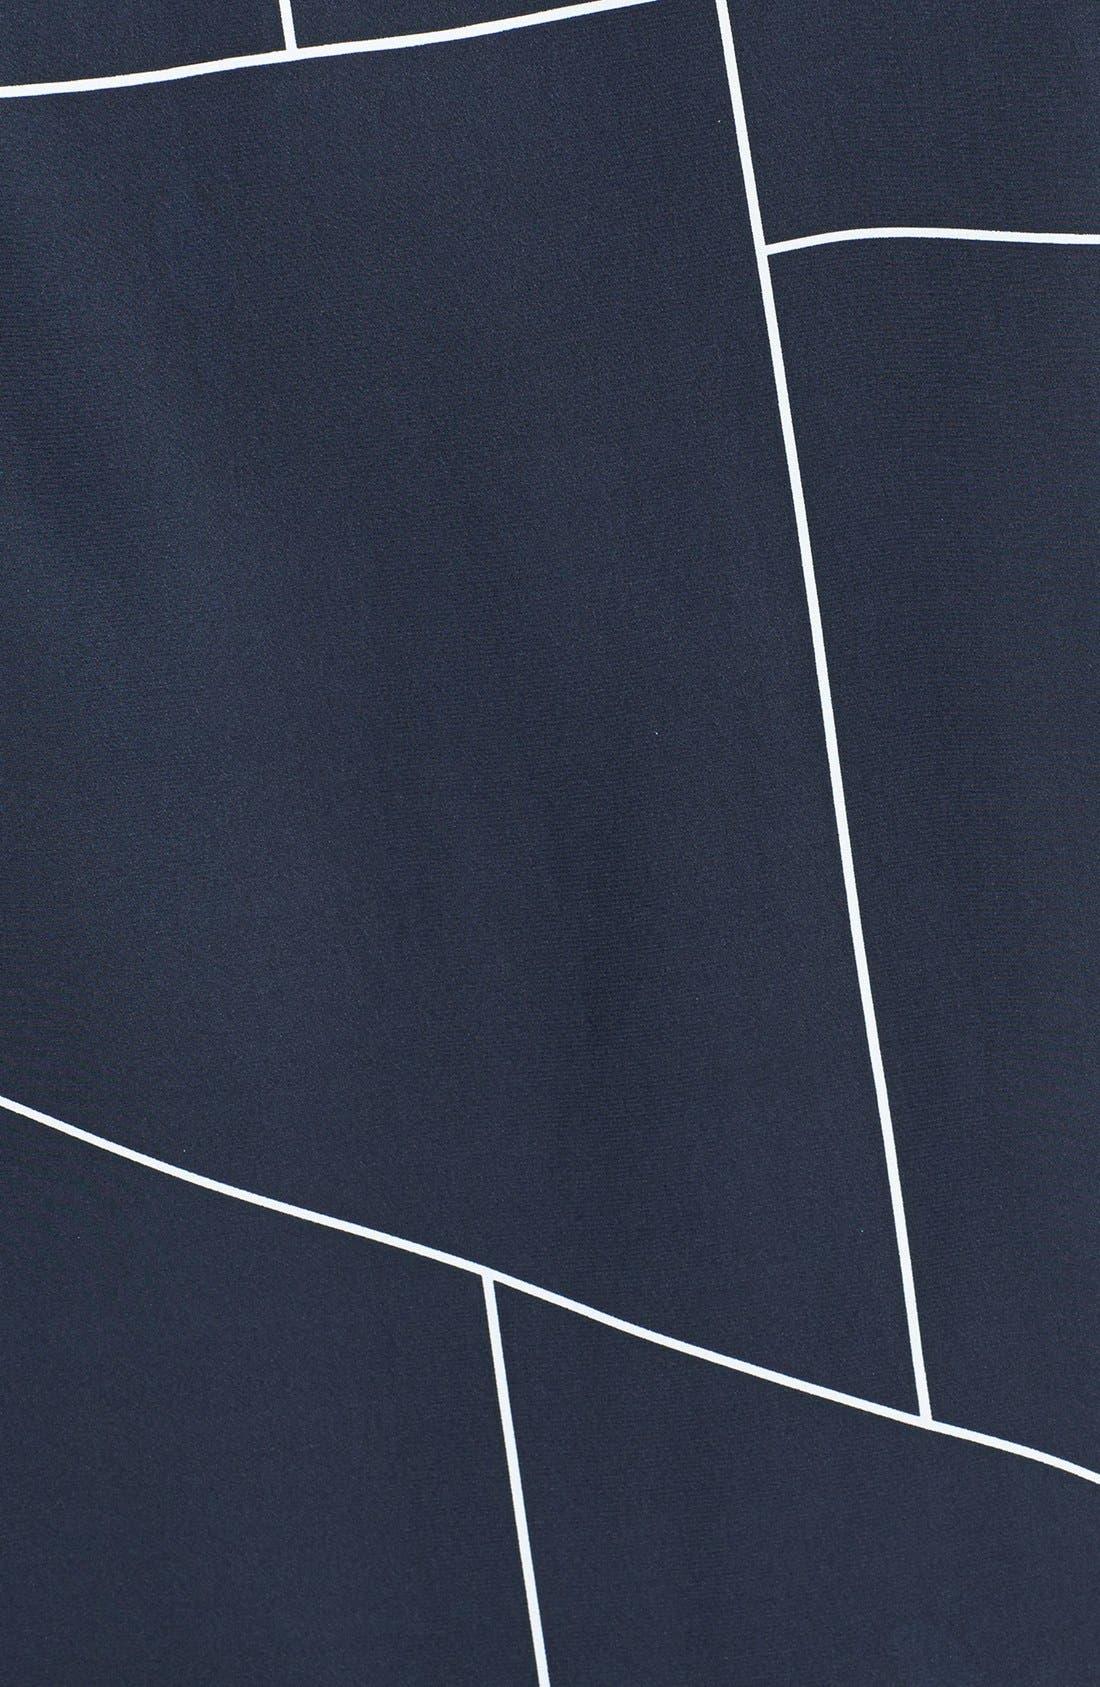 Alternate Image 3  - Theory 'Aquilina B.' Geometric Print Silk Top